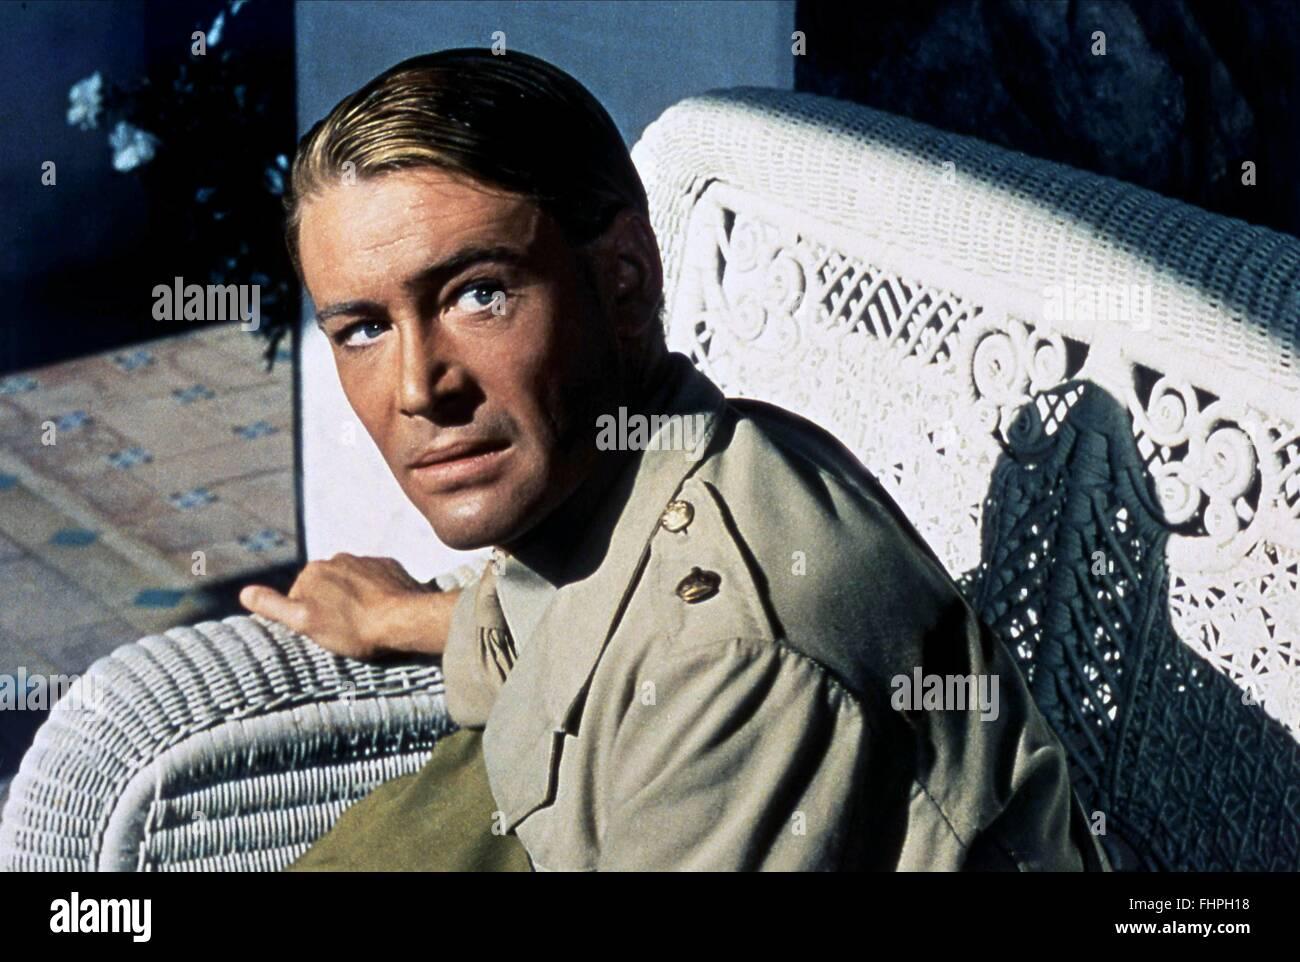 lawrence of arabia 1962 full movie free